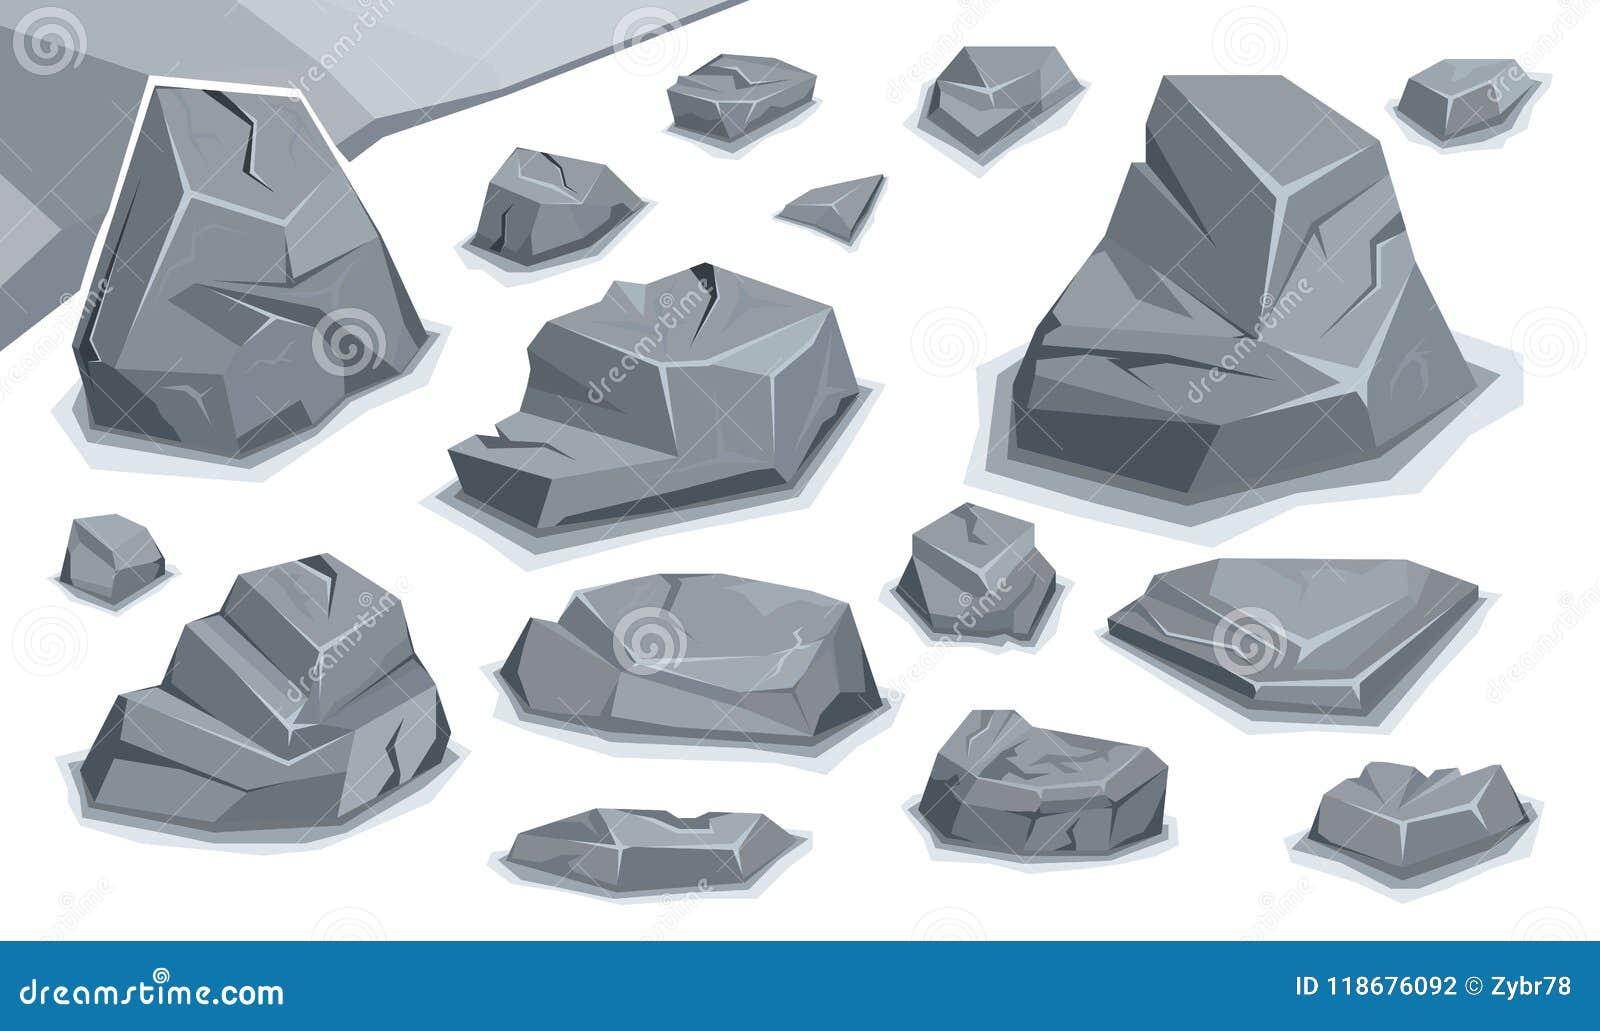 Rock stone set stock vector  Illustration of stone, granite - 118676092